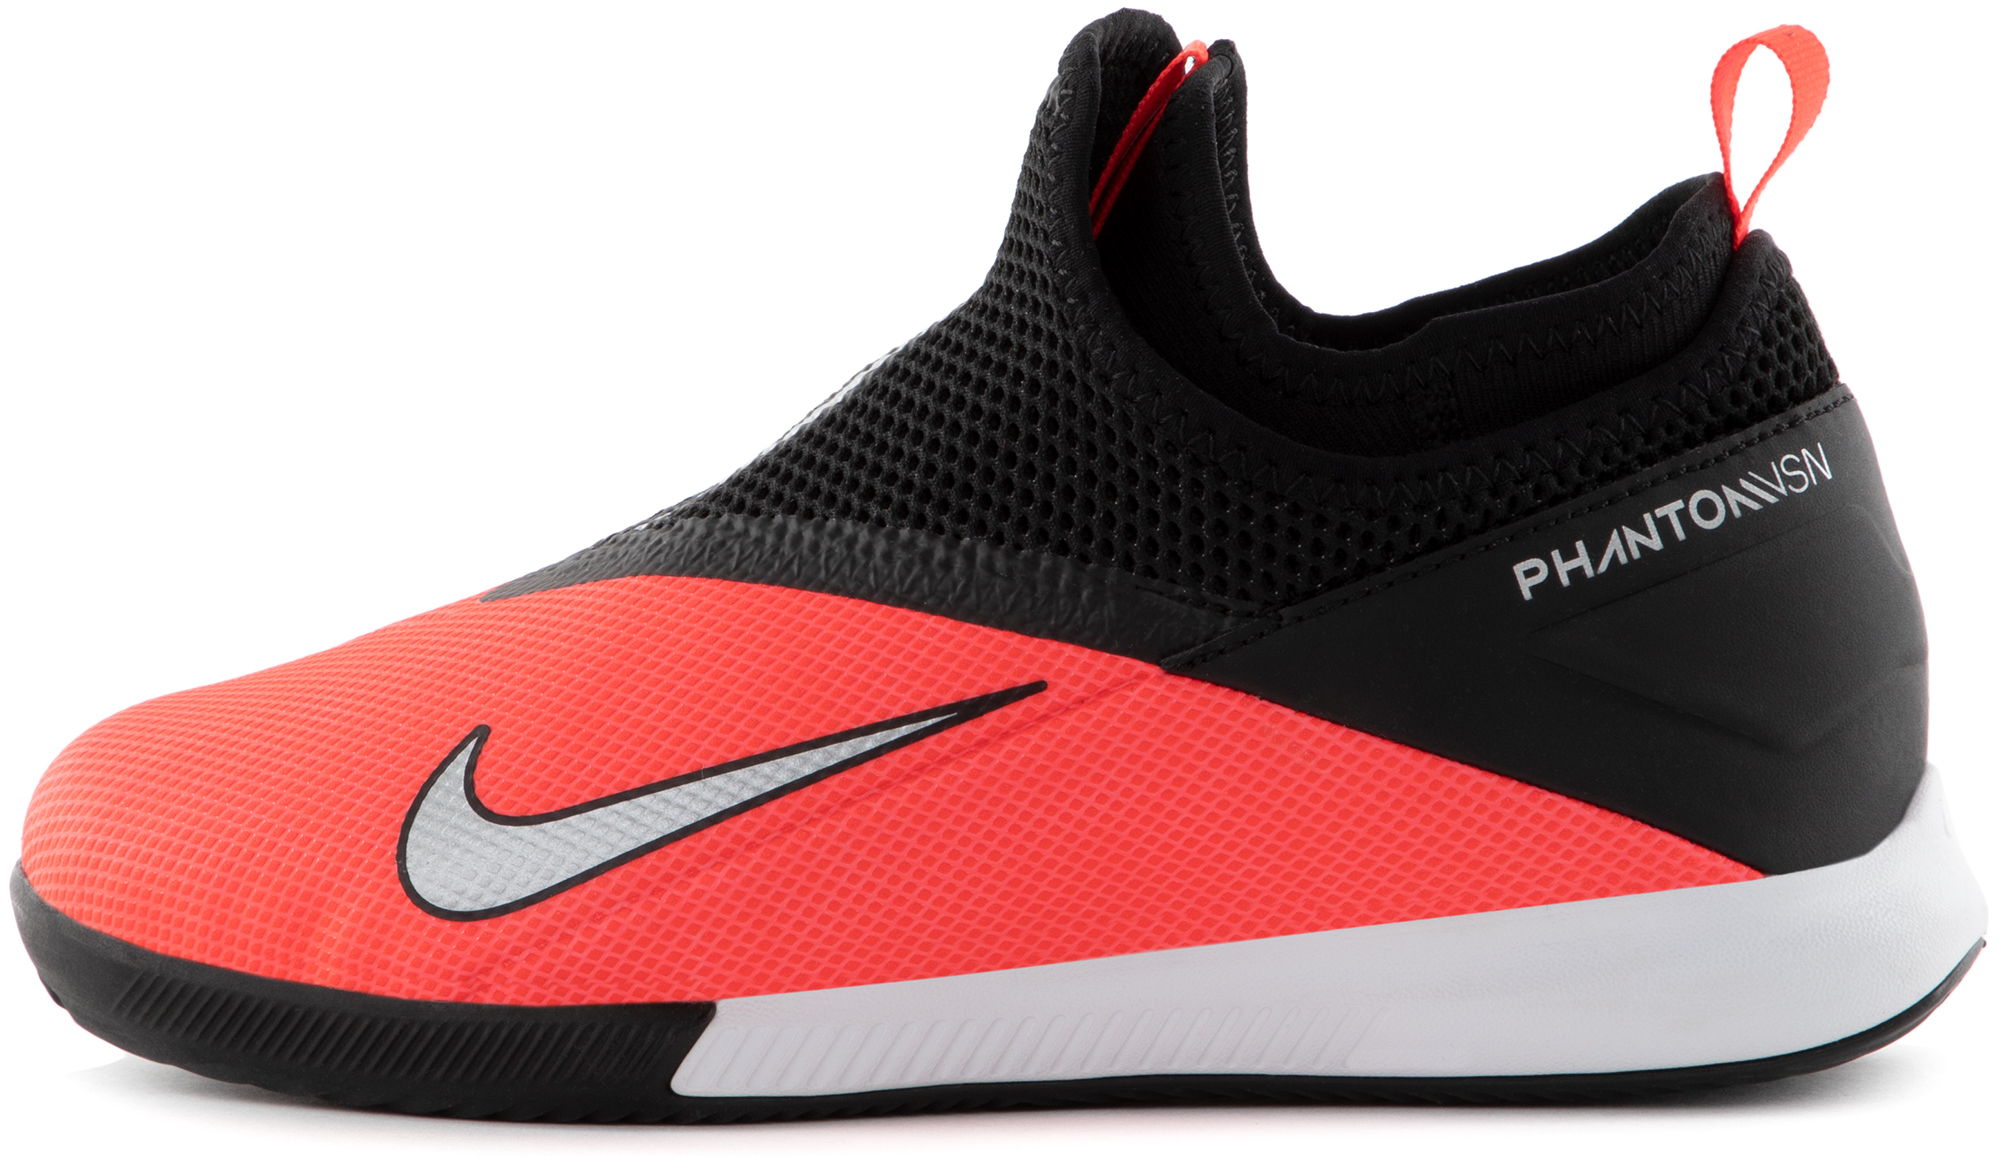 Nike Бутсы для мальчиков Nike Phantom Vision 2 Academy Dynamic Fit IC, размер 35 цена